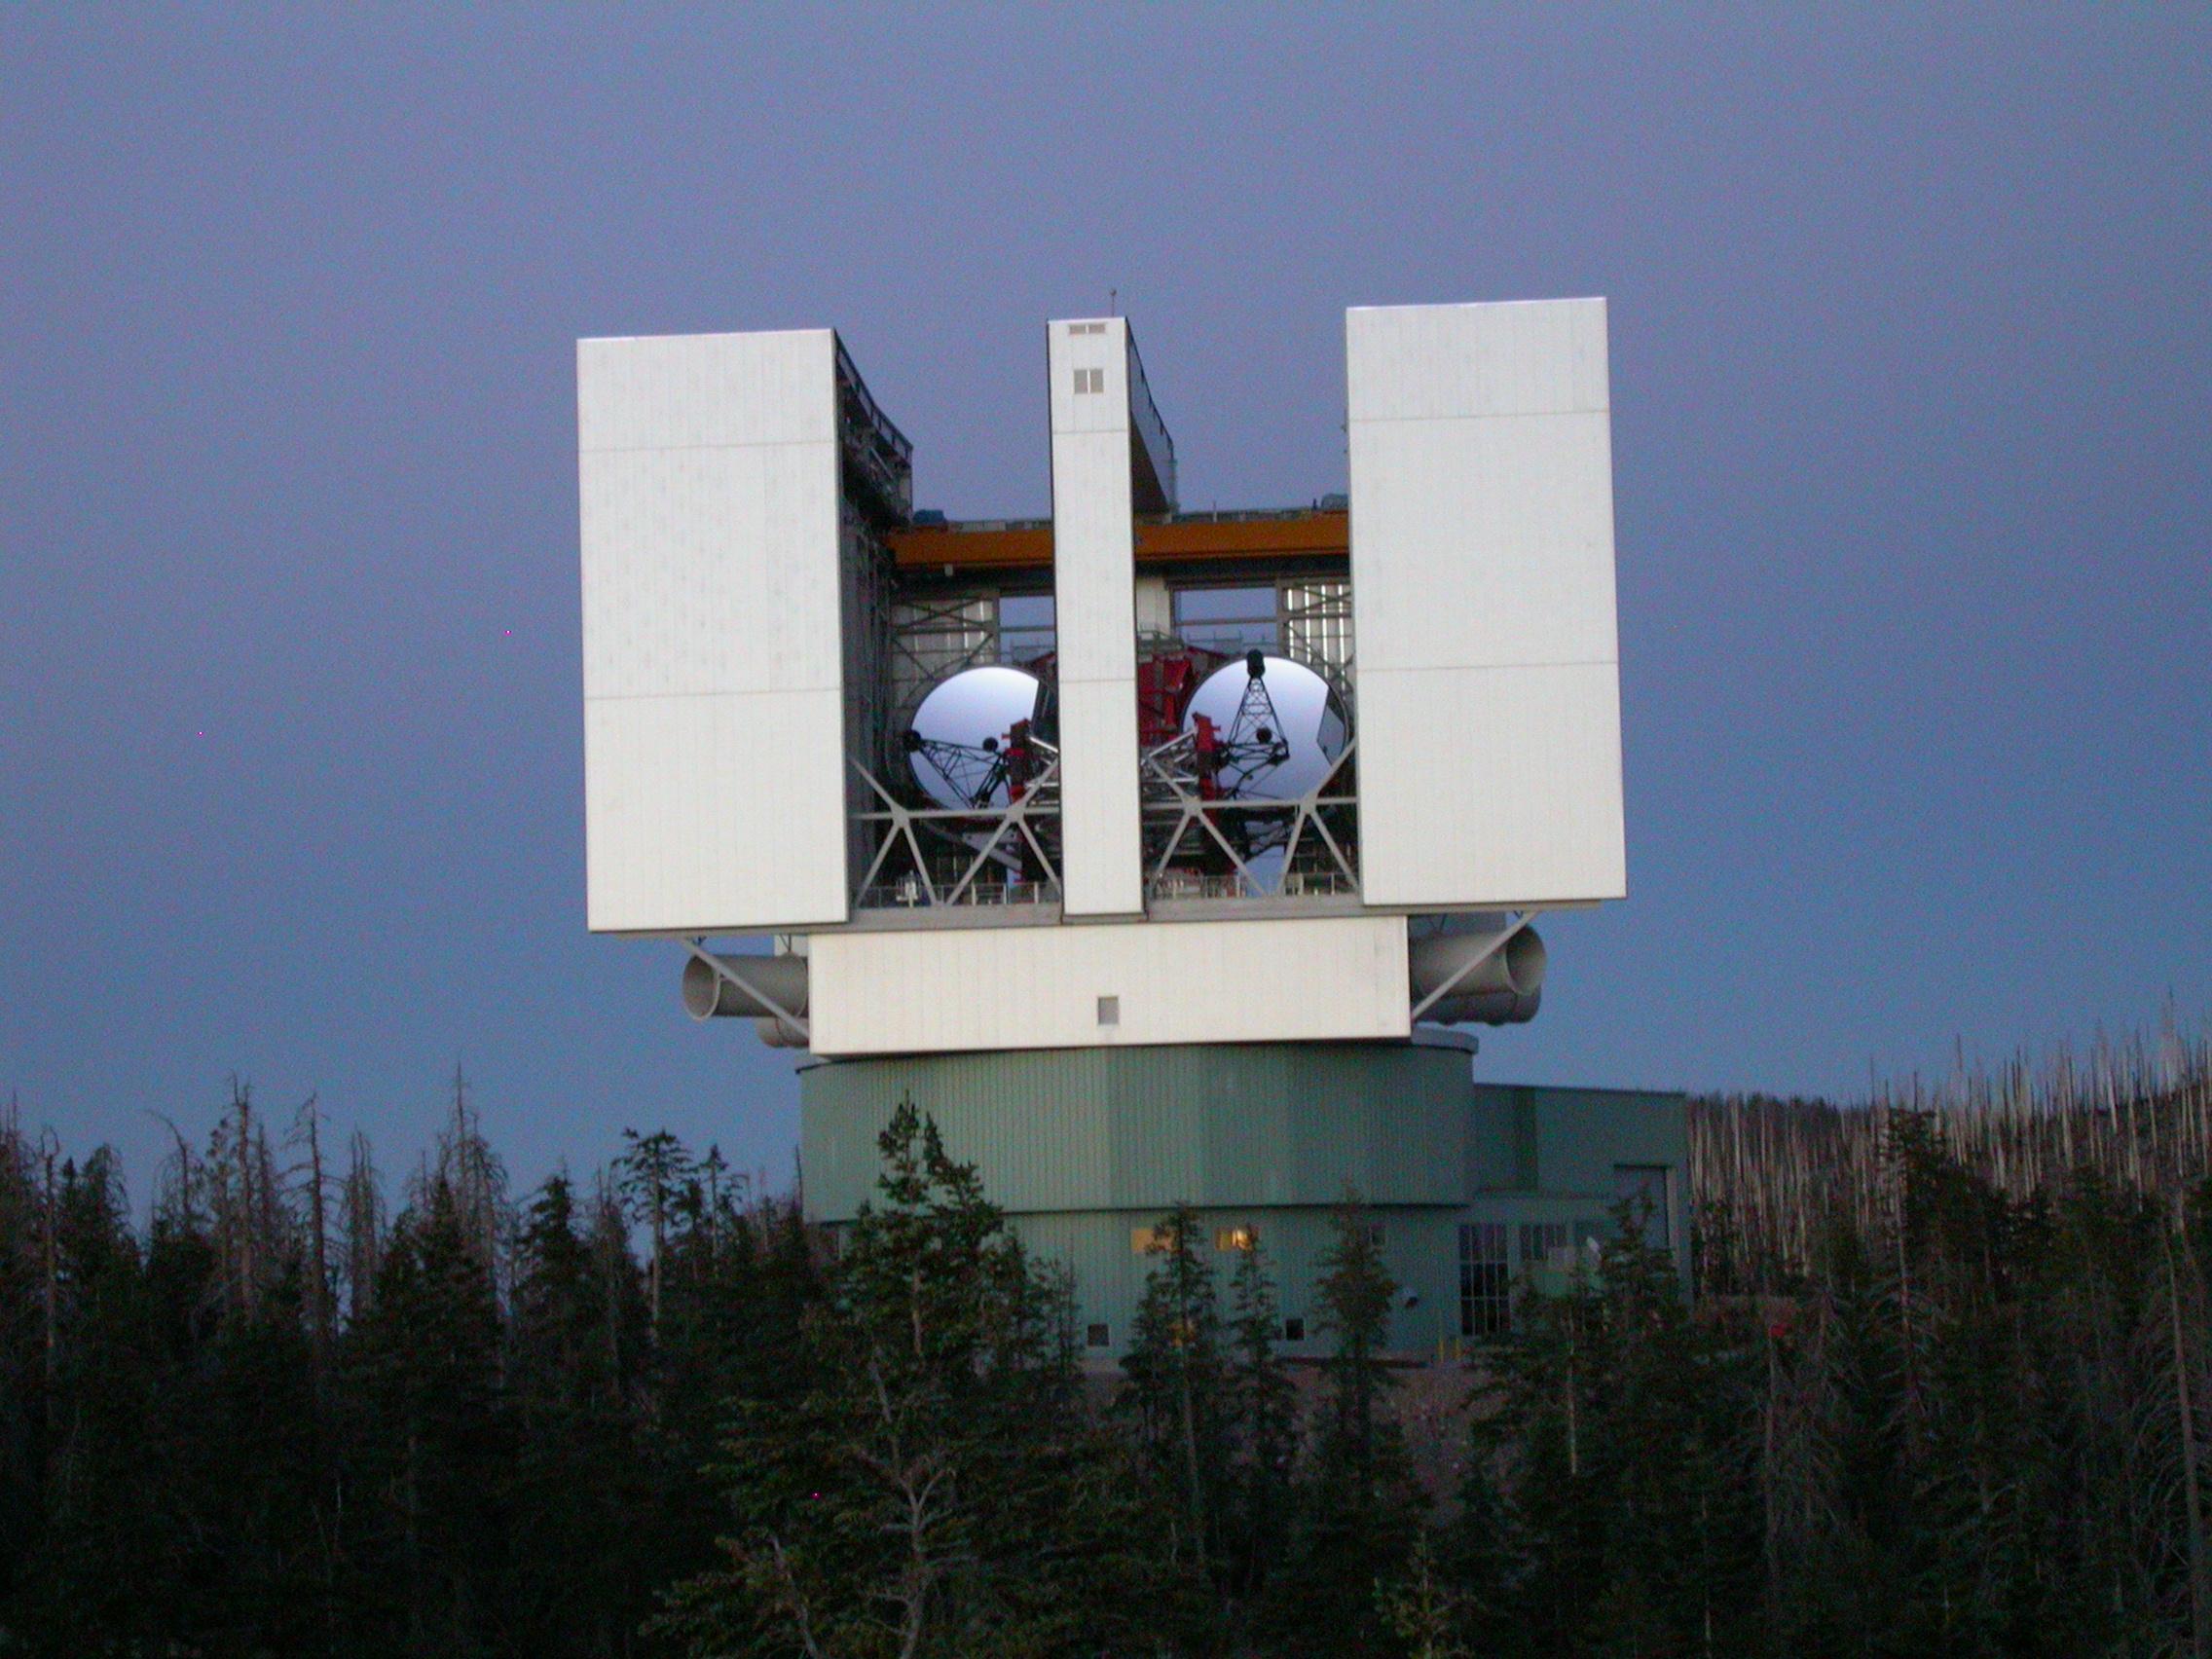 L.U.C.I.F.E.R. at the Mt. Graham Observatory in AZ